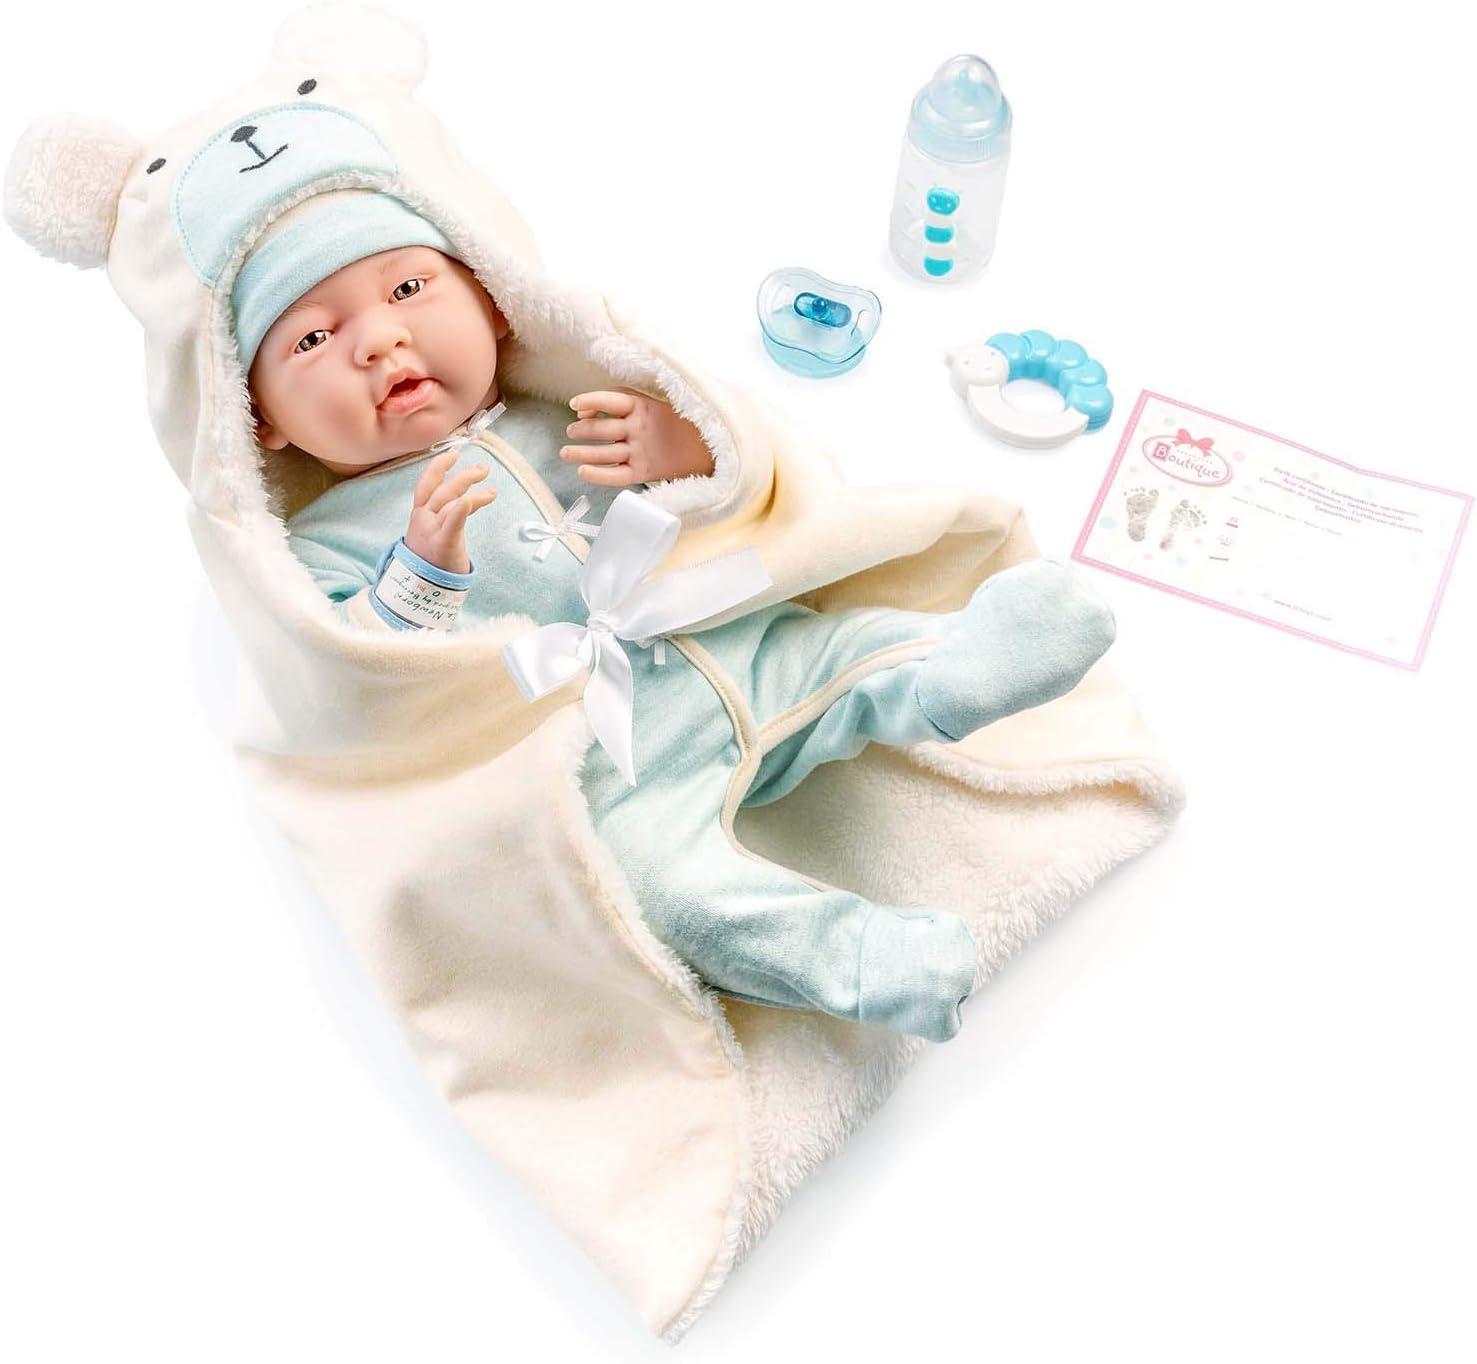 JC TOYS-La Newborn Muñeco bebé, Color Azul (18790)